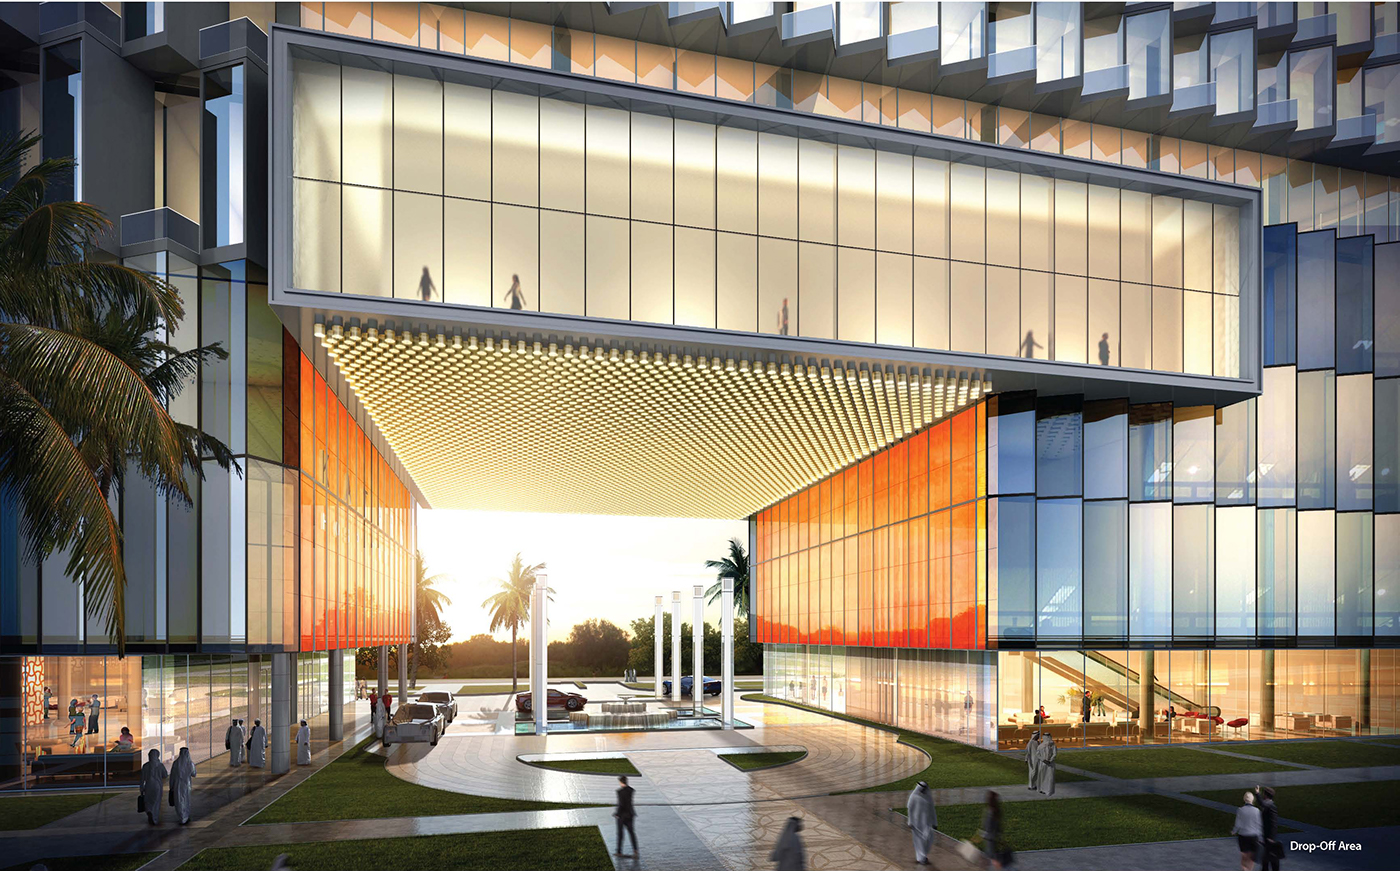 5 Star Hotel & Serviced Apartment - Doha , Qatar on Behance